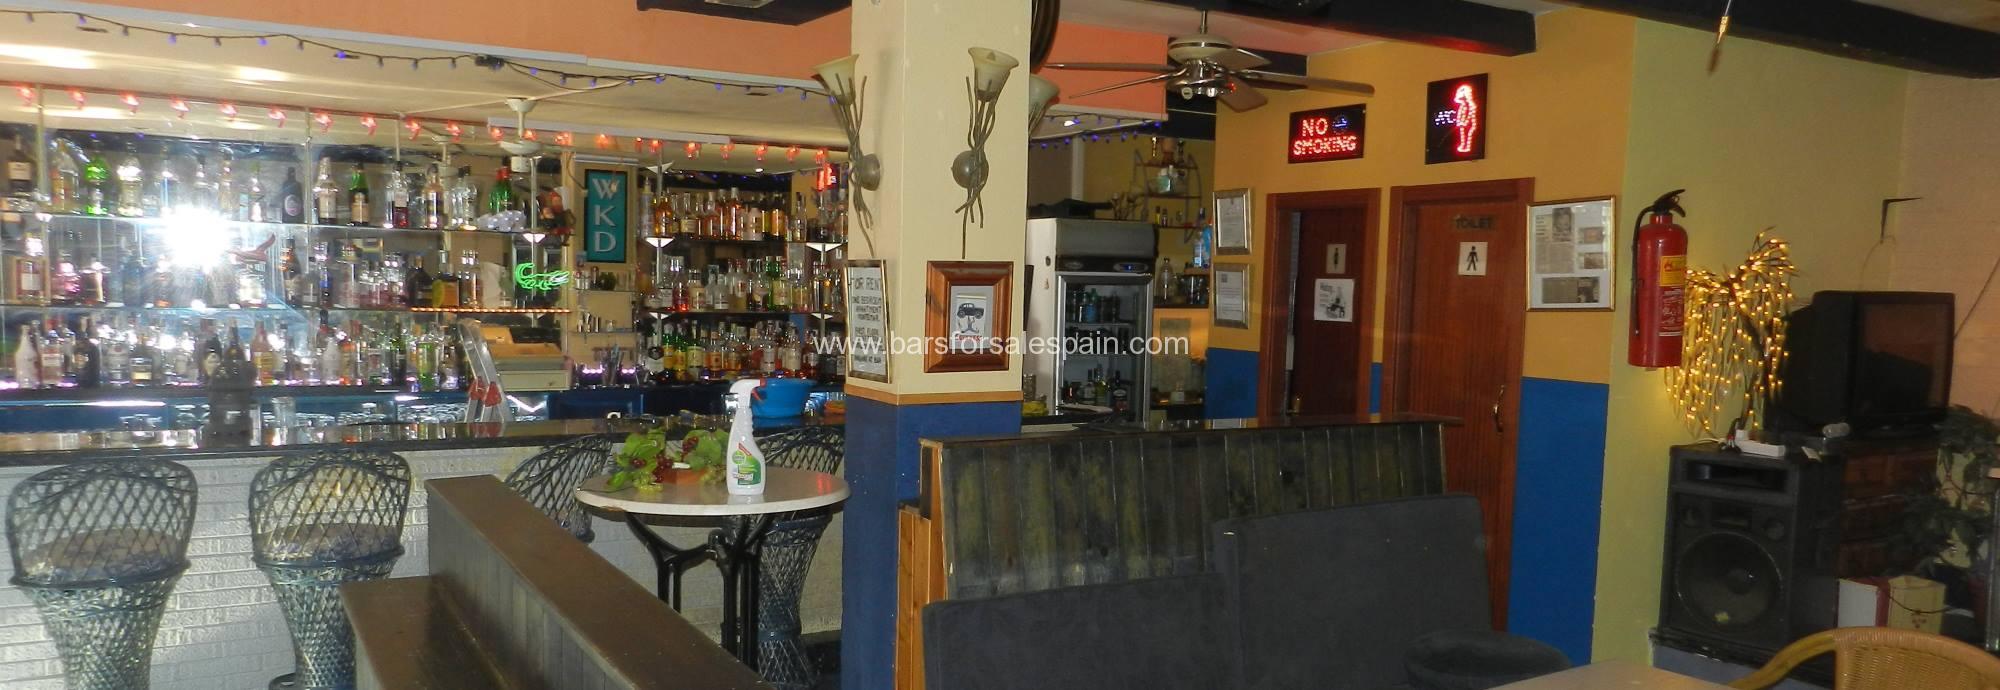 Music Bar For Sale in Torremolinos, Malaga, Spain